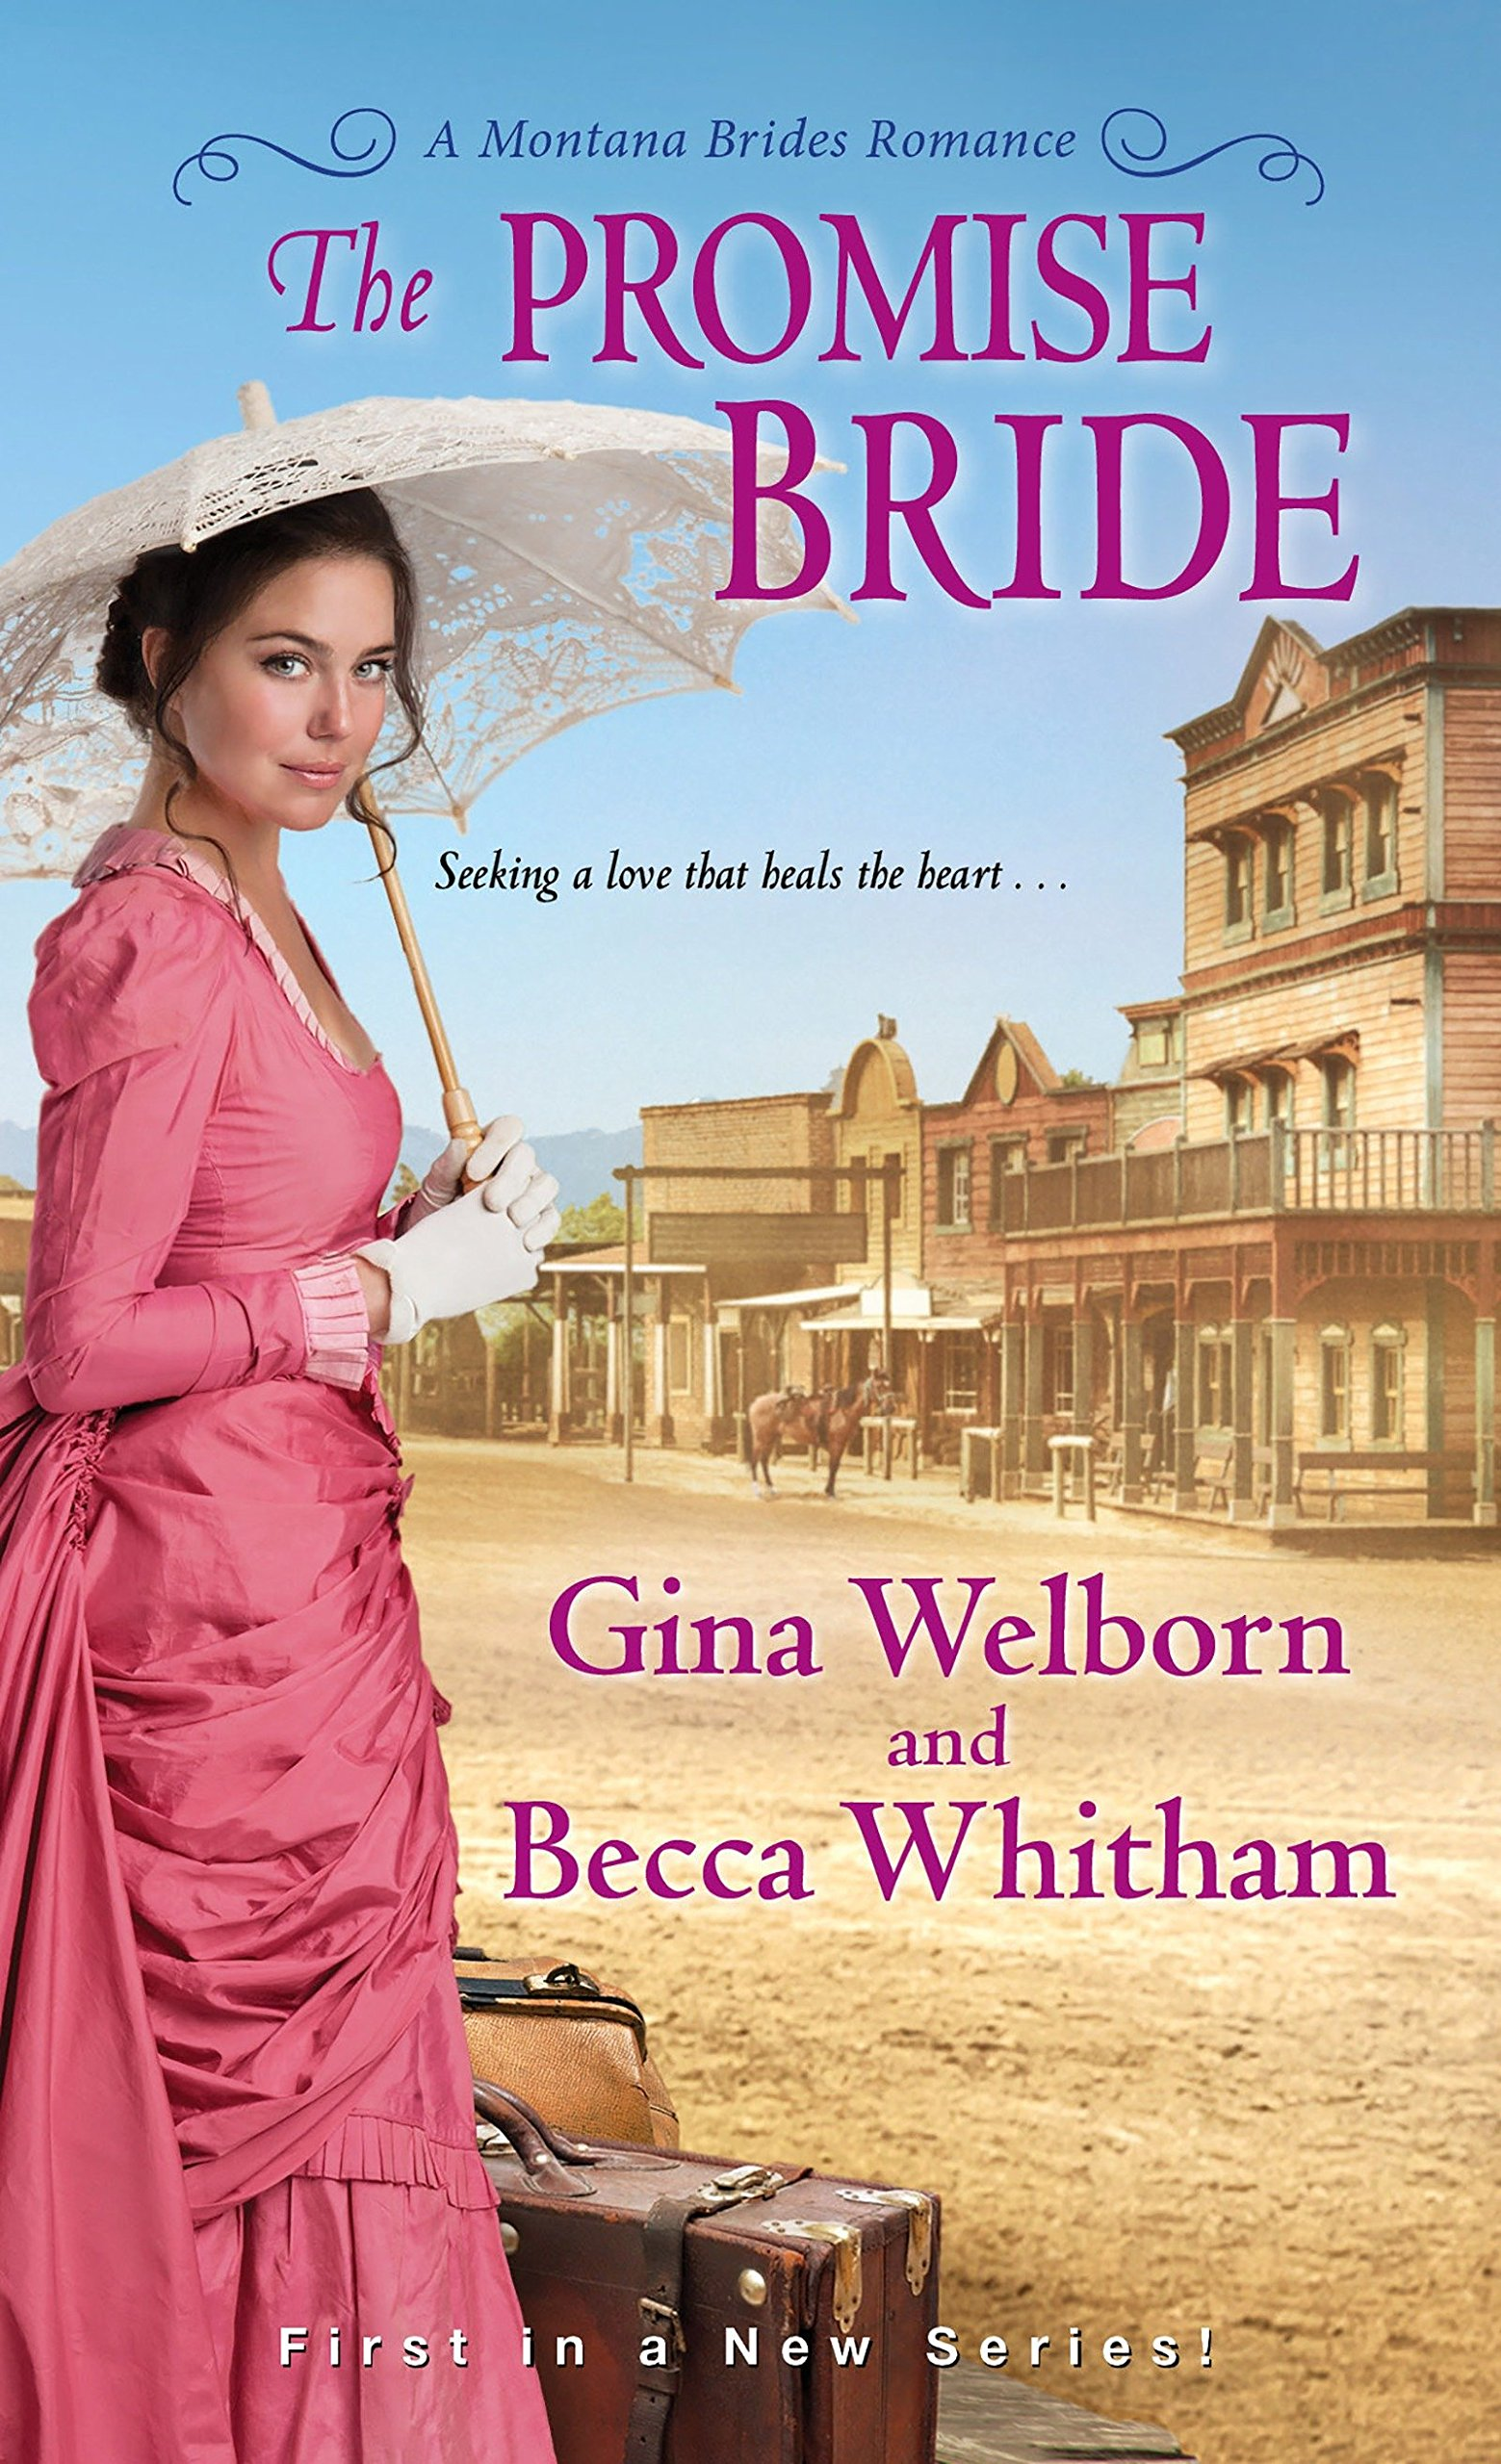 The Promise Bride (A Montana Brides Romance) ebook